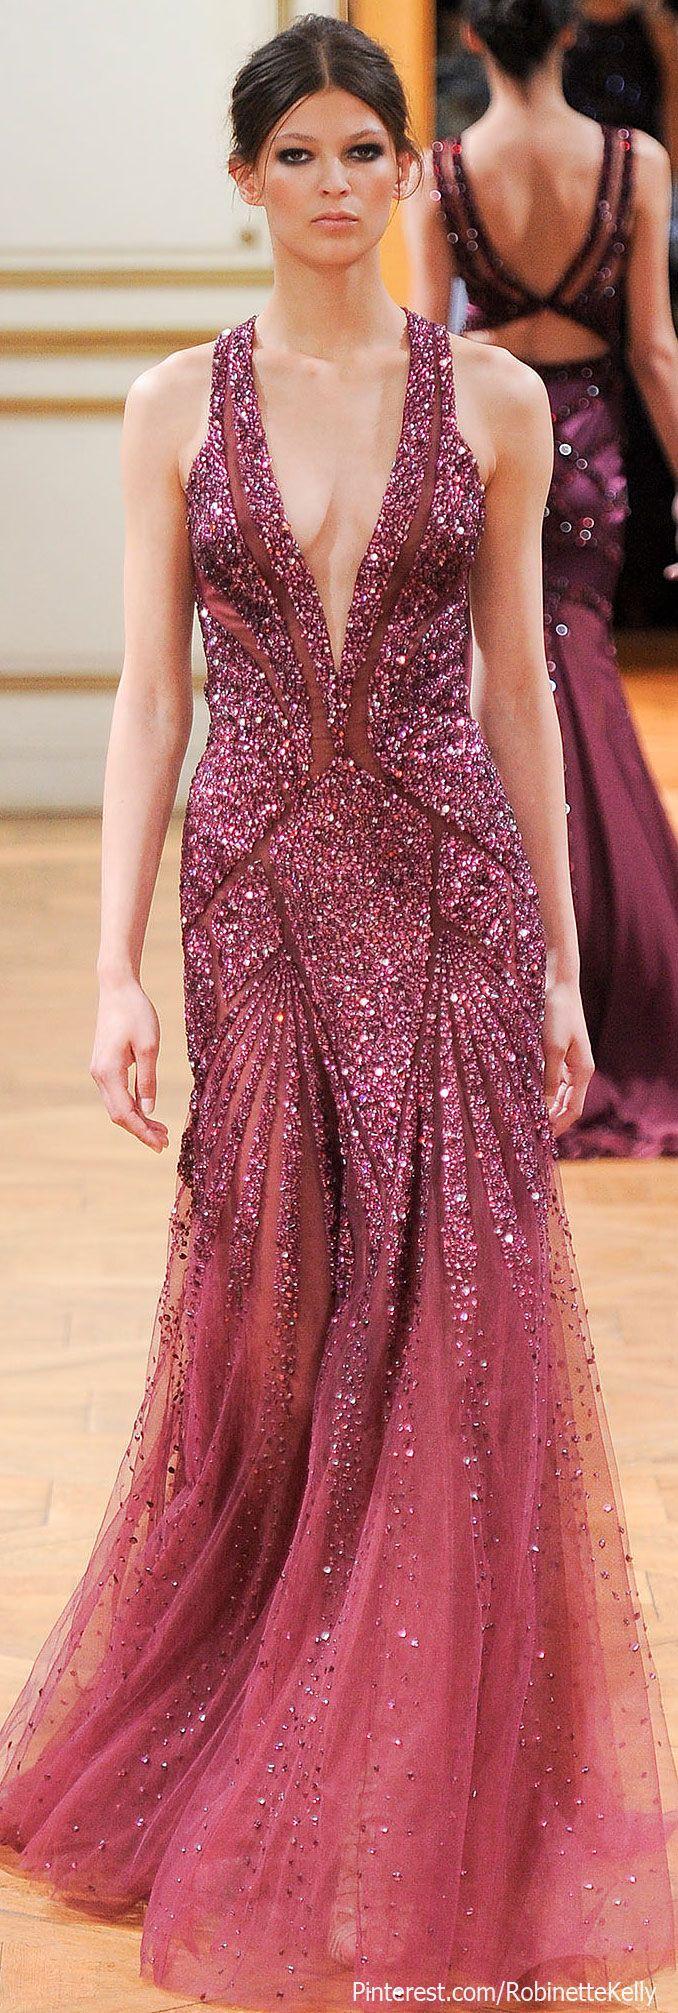 Zuhair murad haute couture fw zuhairmurad couture fashion